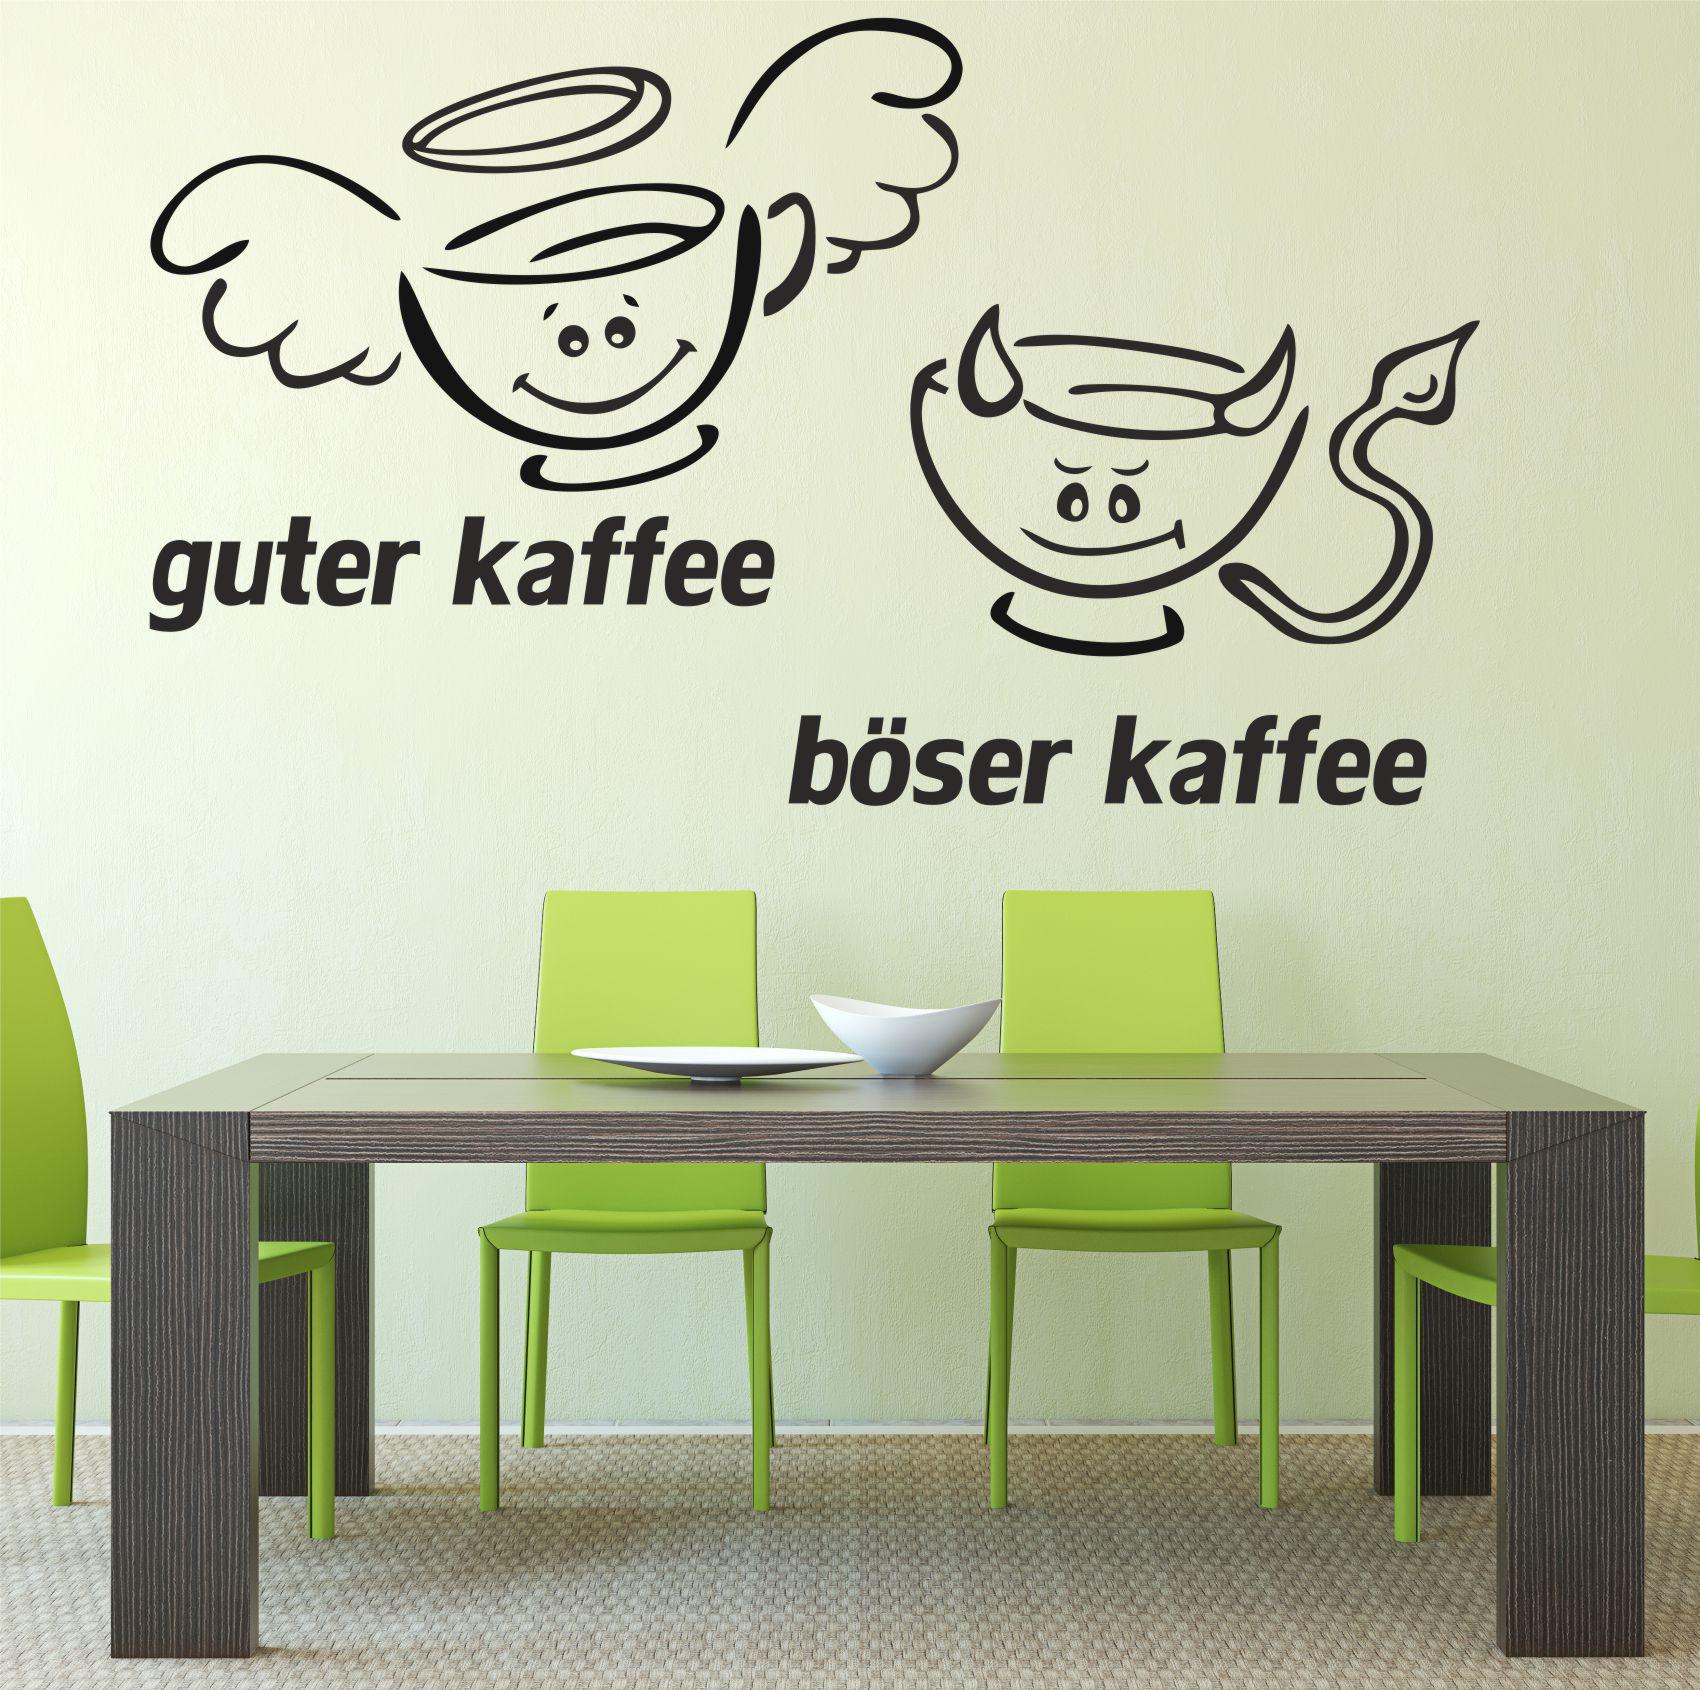 kaffee bilder f r die k che seo k che ikea knoxhult erfahrung abverkauf 160 cm ivar steckdose. Black Bedroom Furniture Sets. Home Design Ideas